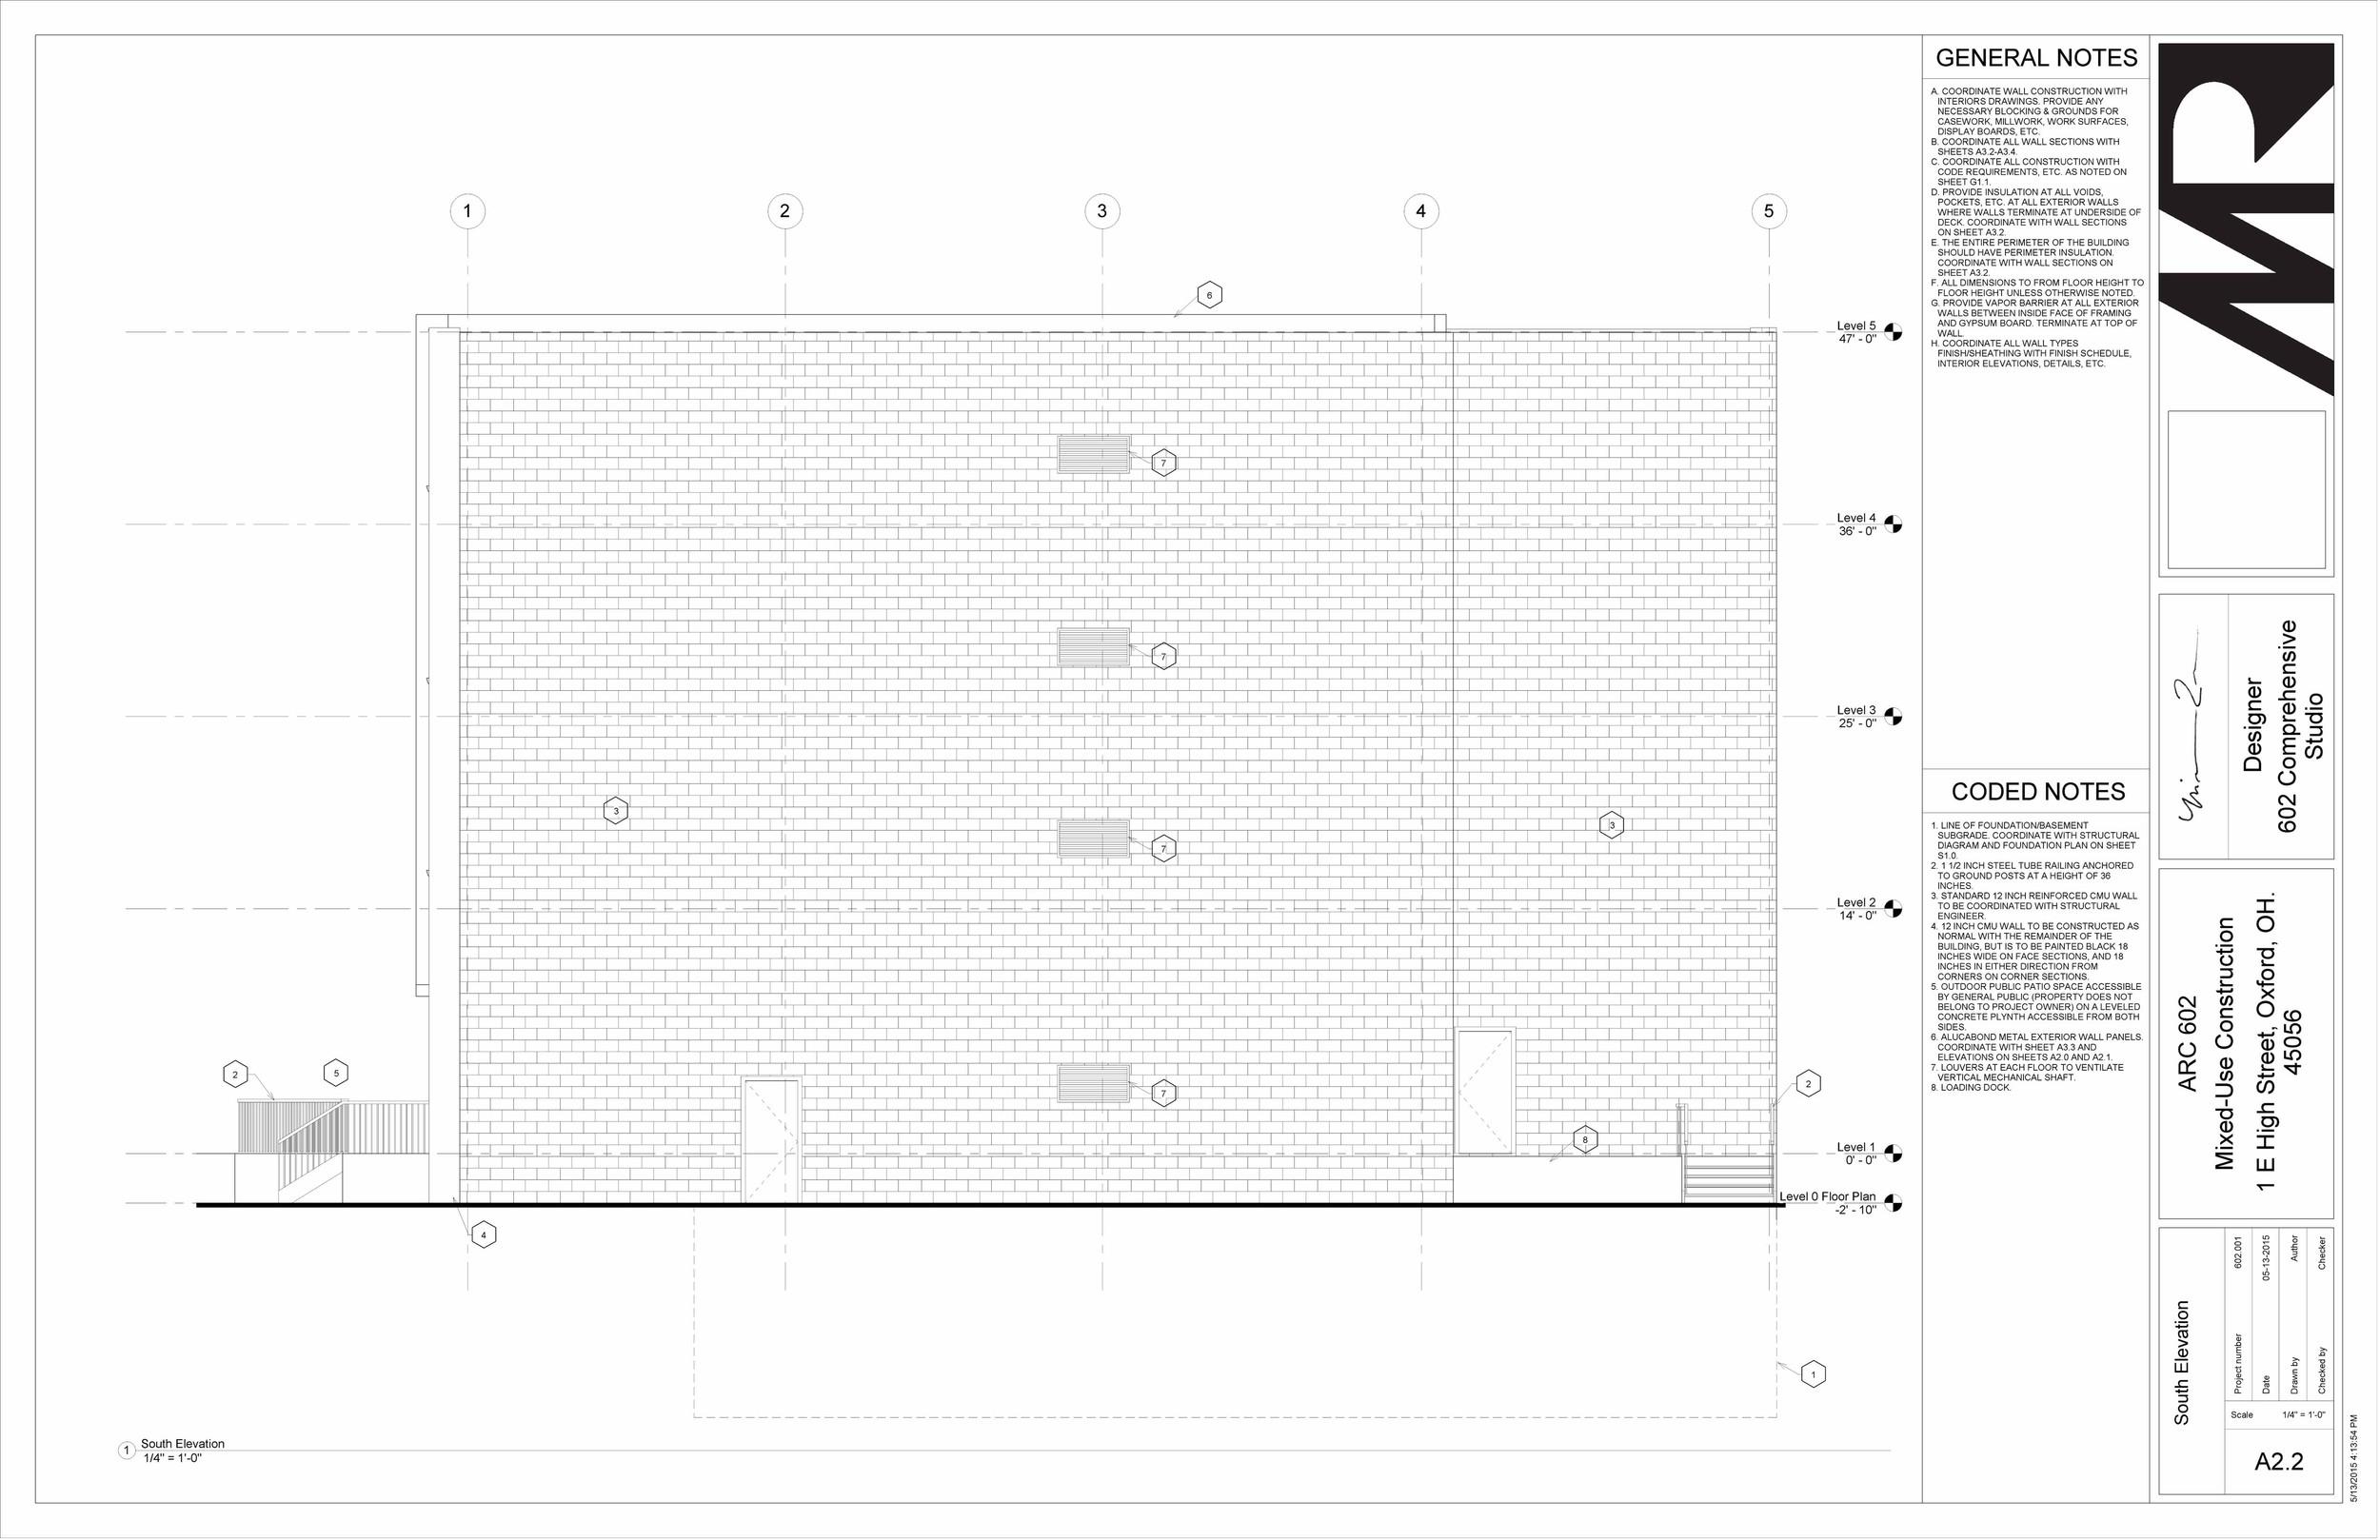 602 Studio - Sheet - A2-2 - South Elevation copy.jpg